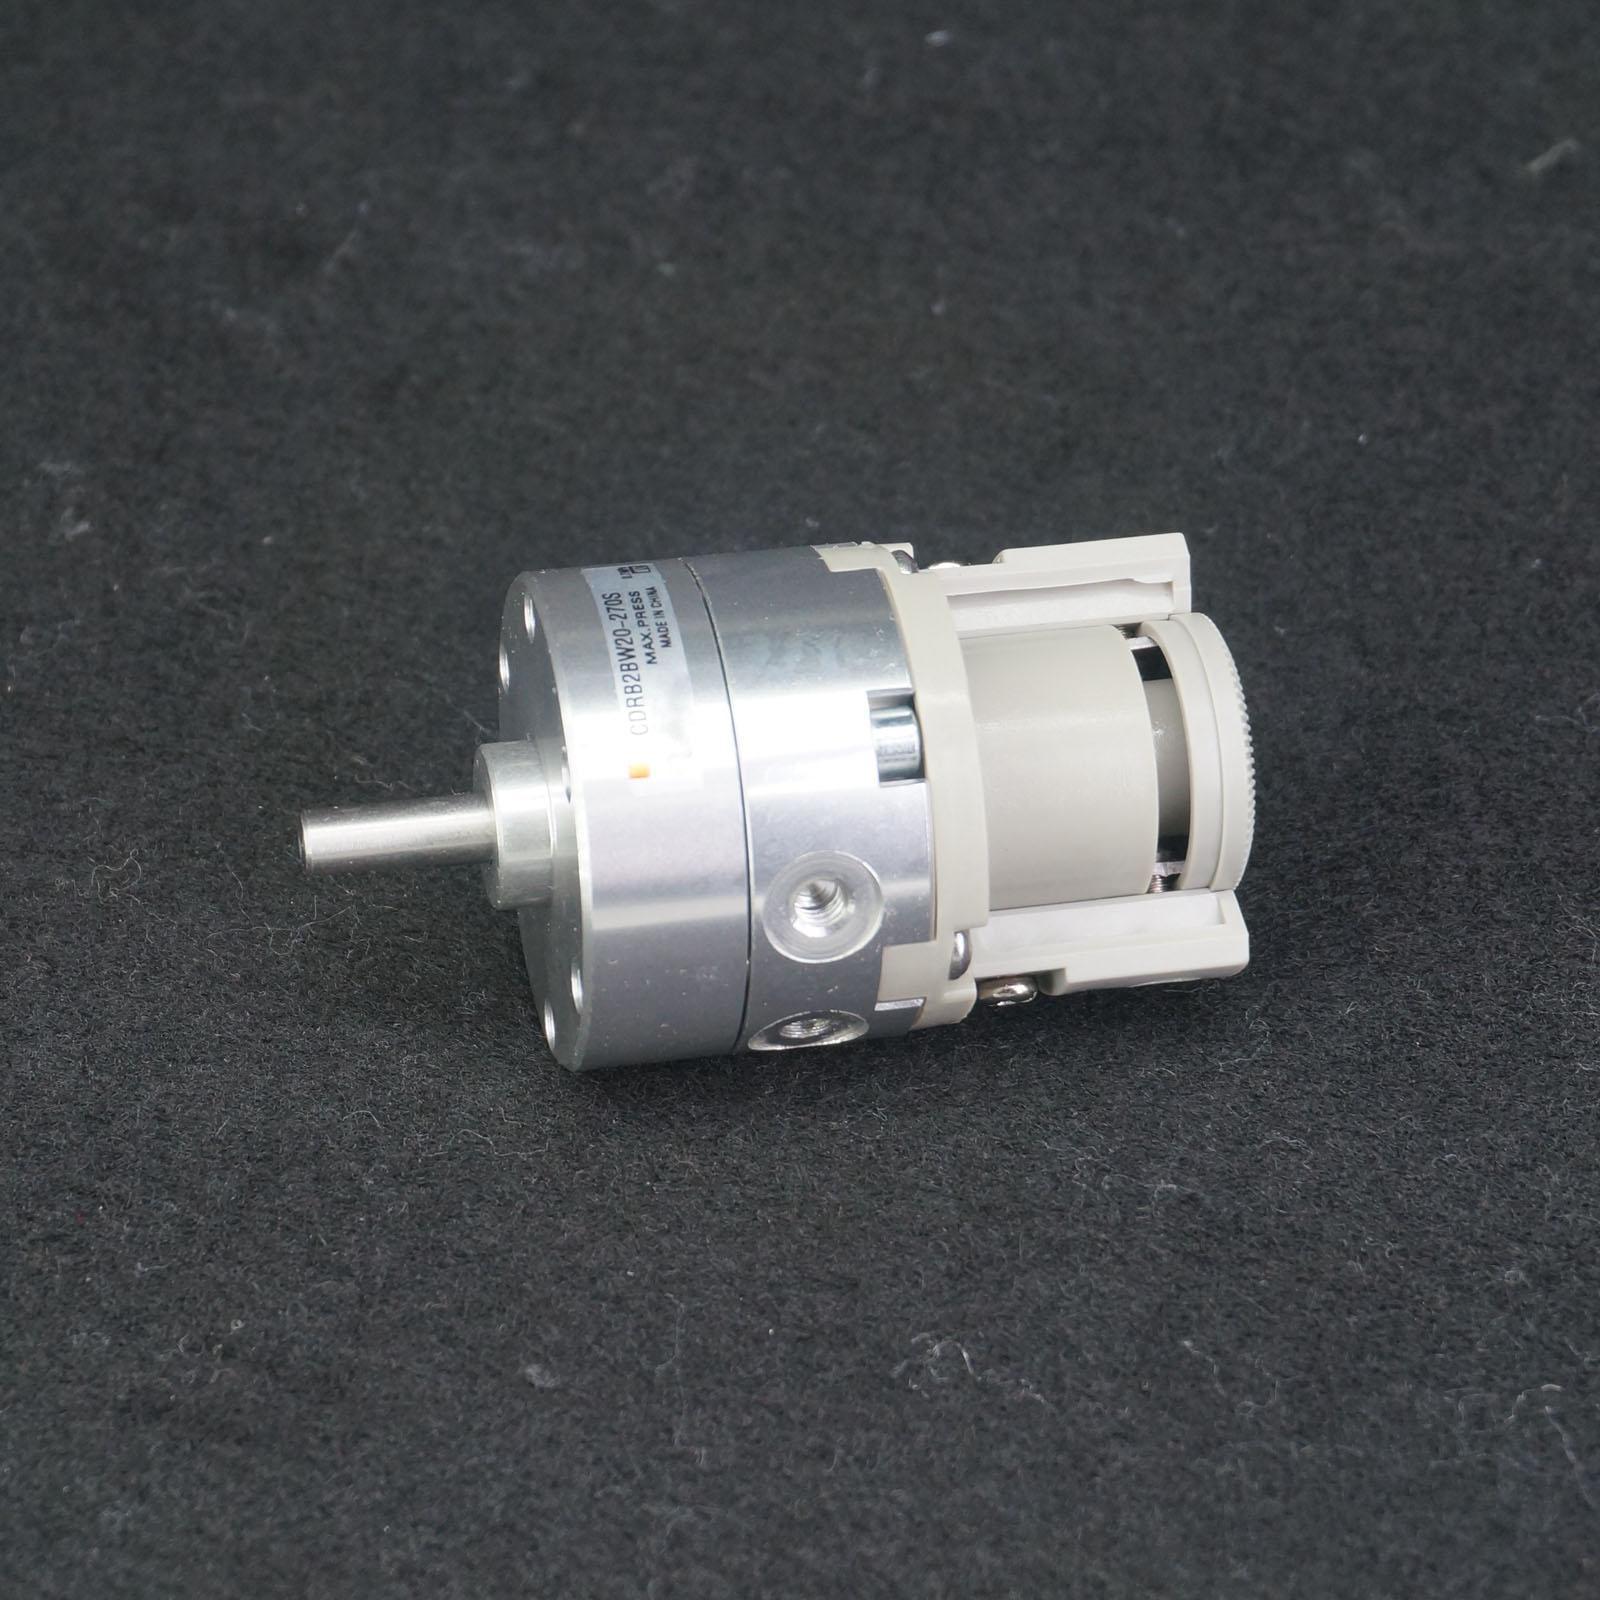 все цены на CDRB2BW20-270S Rotary Cylinder 20mm Rotate 270 Double Shaft With Magnet онлайн